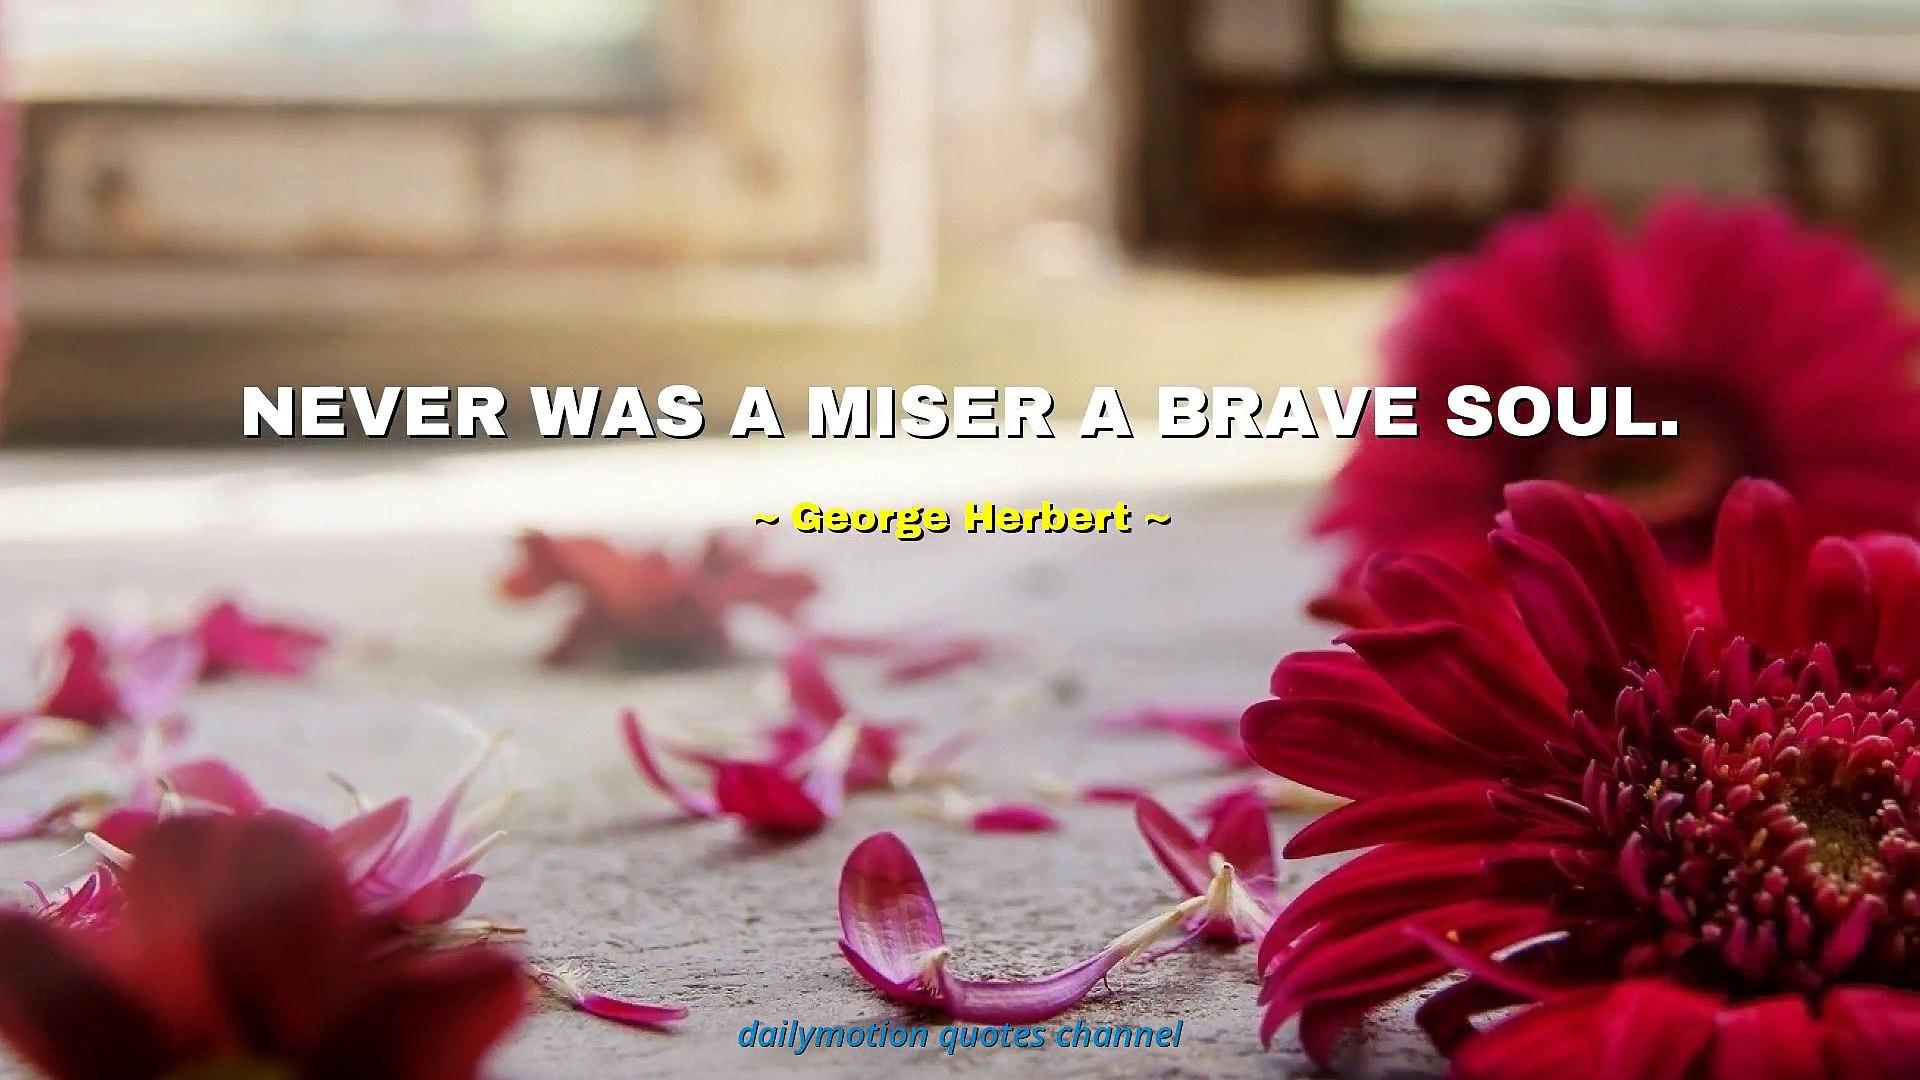 George Herbert Quotes #2